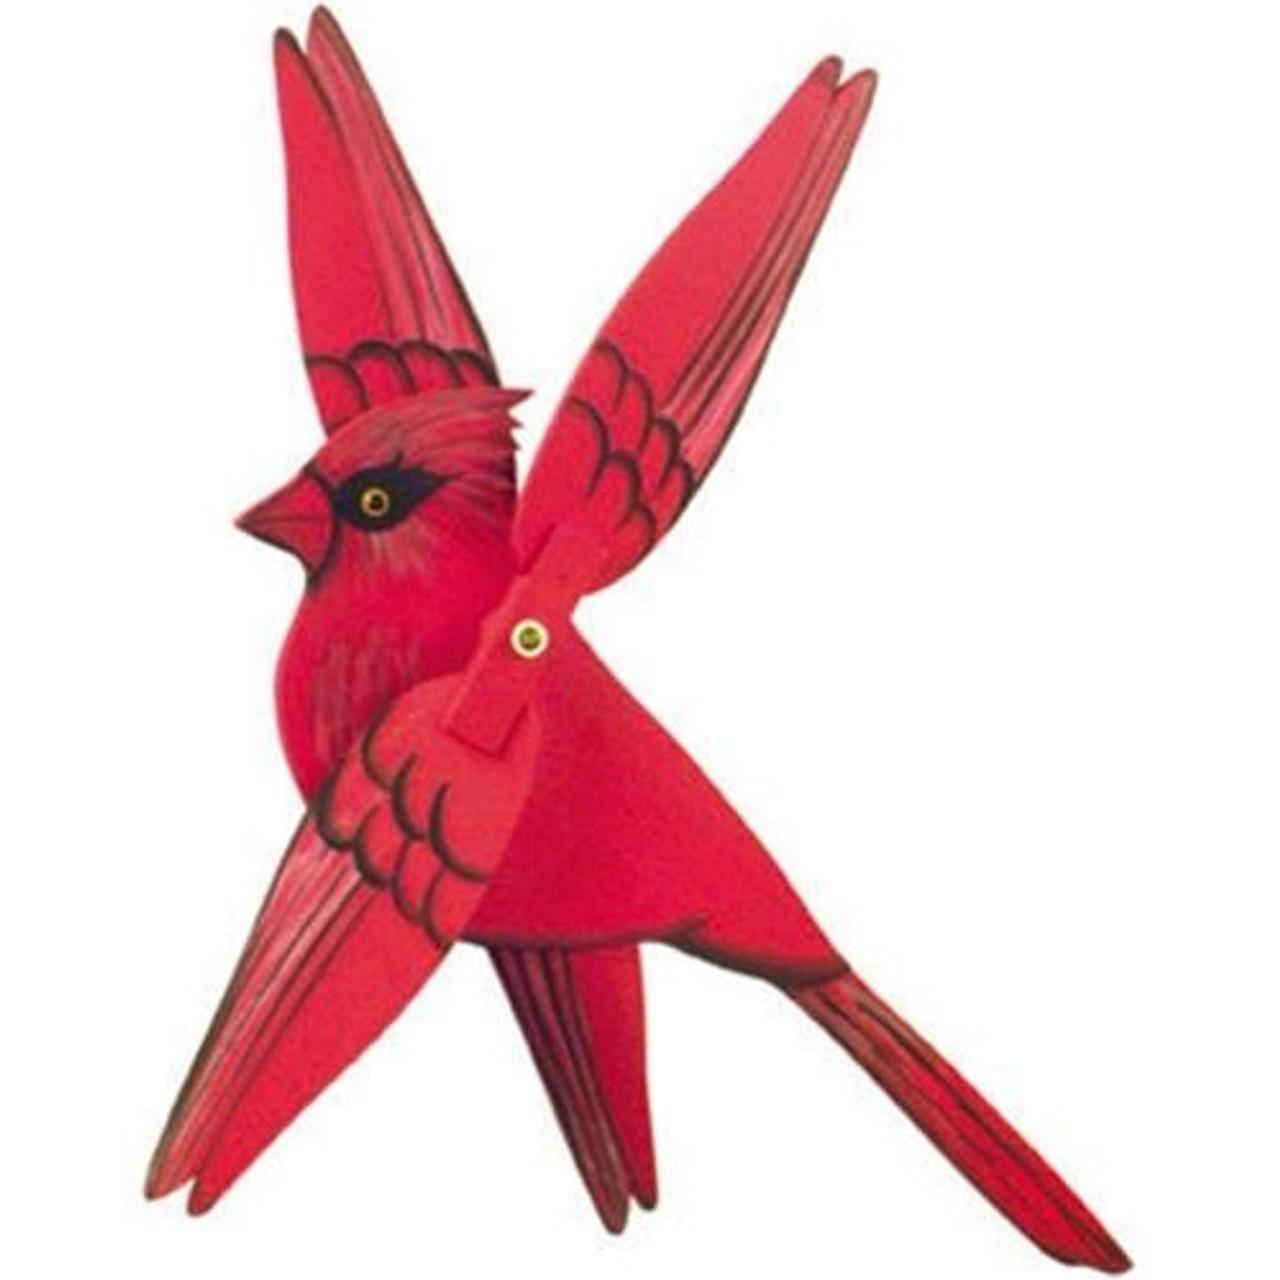 Cherry Tree Toys Male Cardinal Whirligig DIY Kit